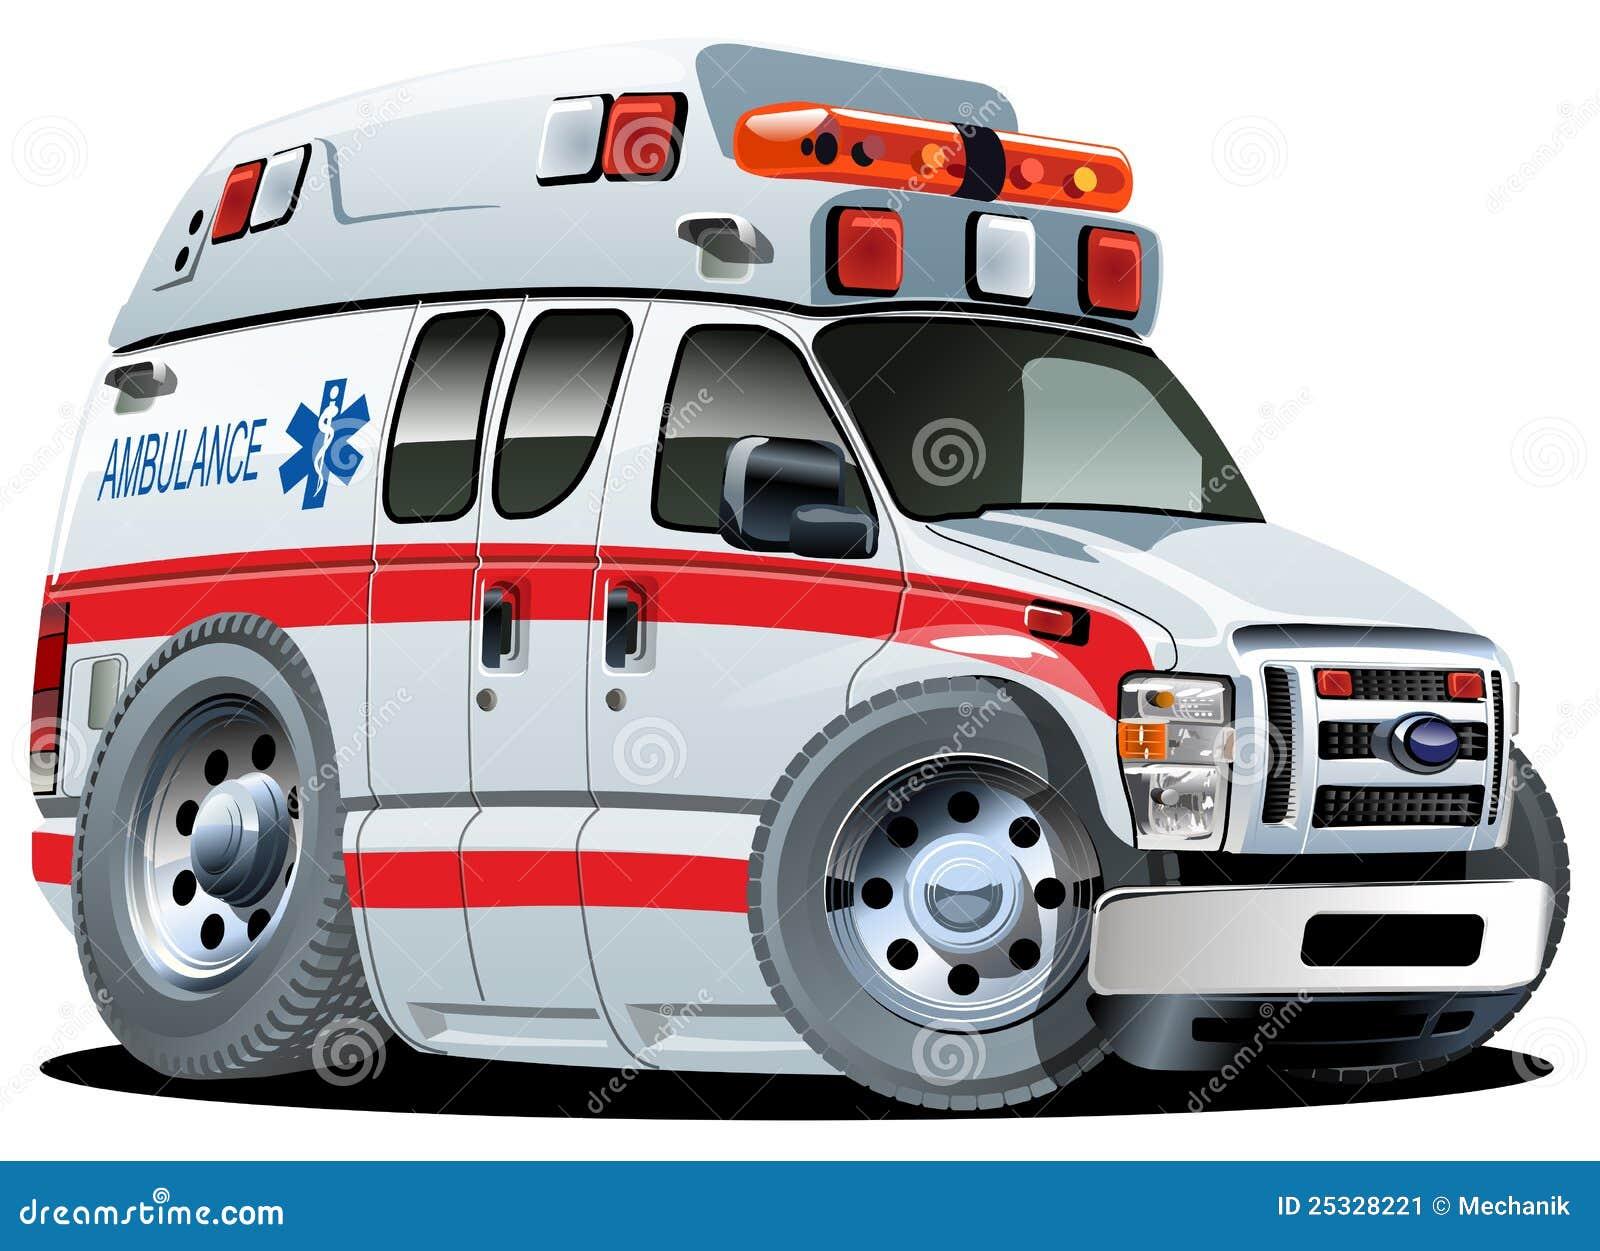 Vehicule D Ambulance De Dessin Anime De Vecteur Illustration De Vecteur Illustration Du Dessin Ambulance 25328221